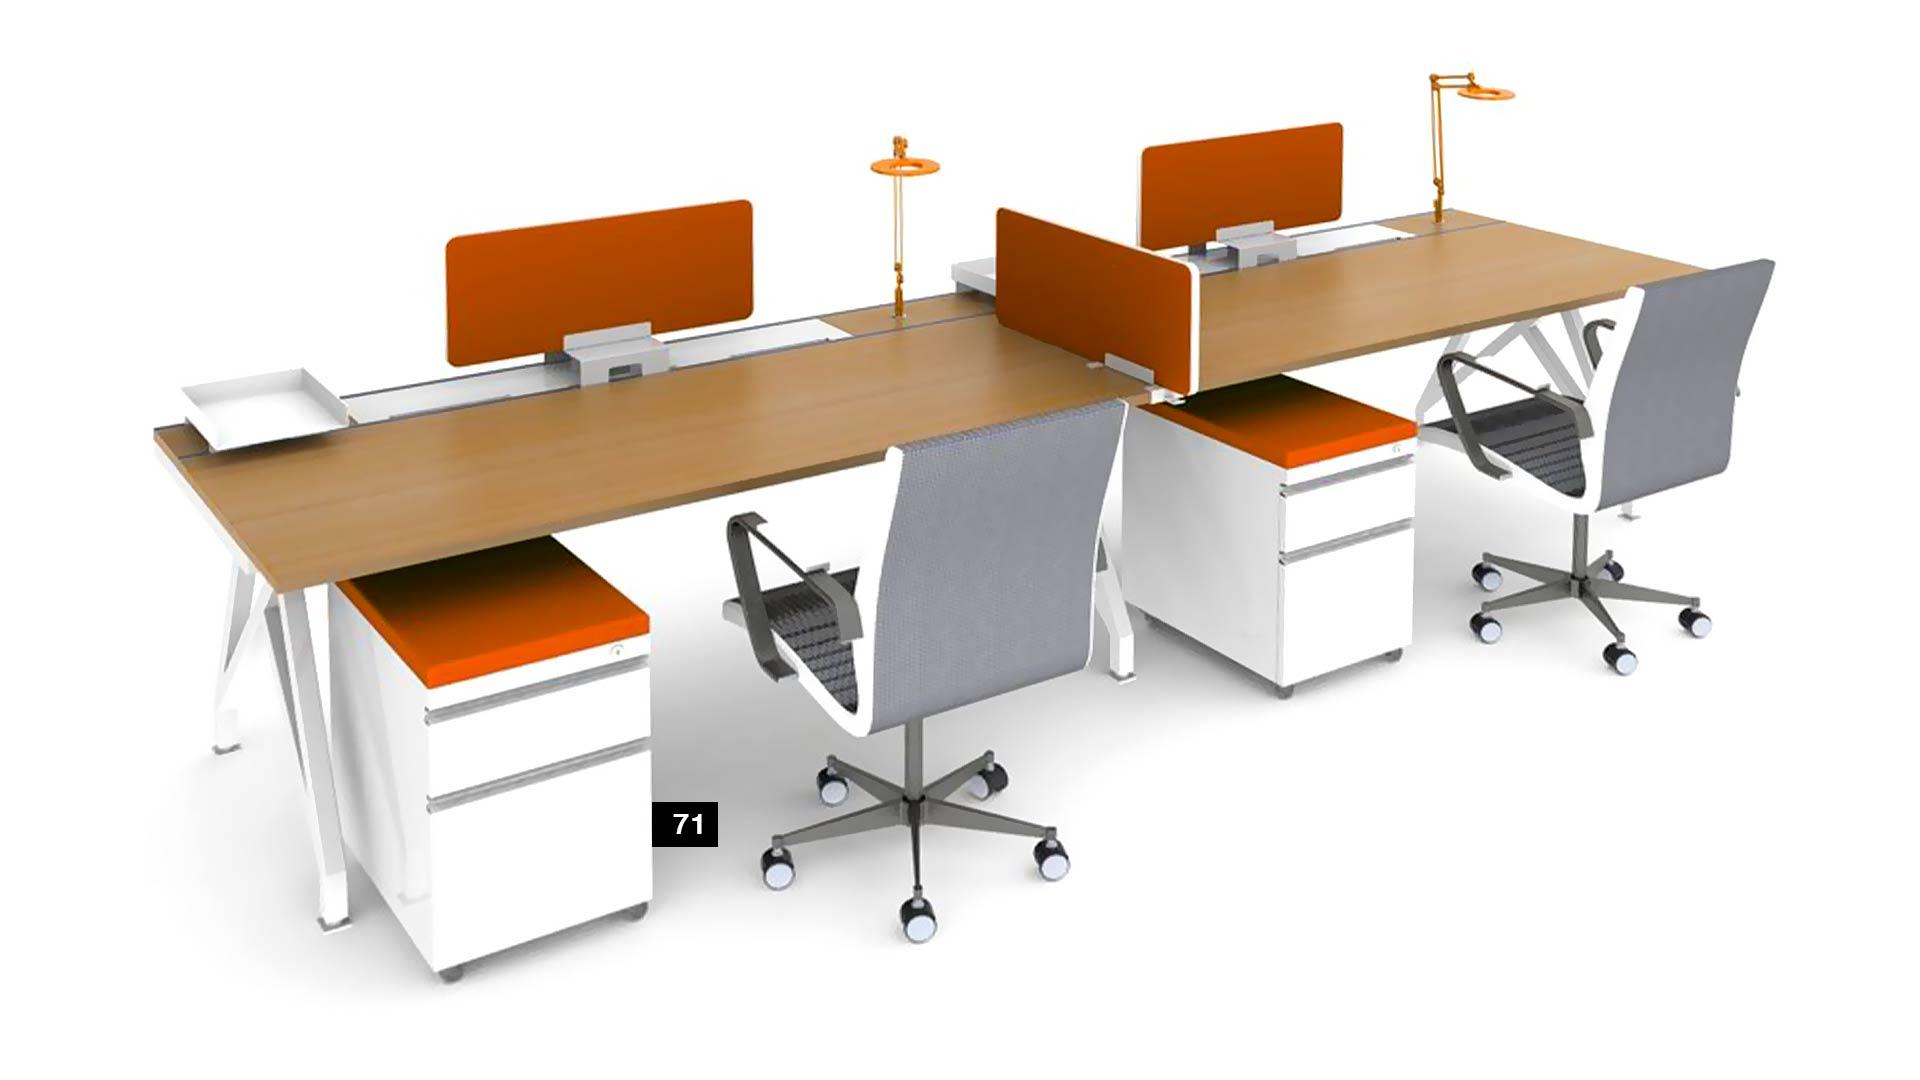 open-plan-benching-scale-1.1-eyhov-3